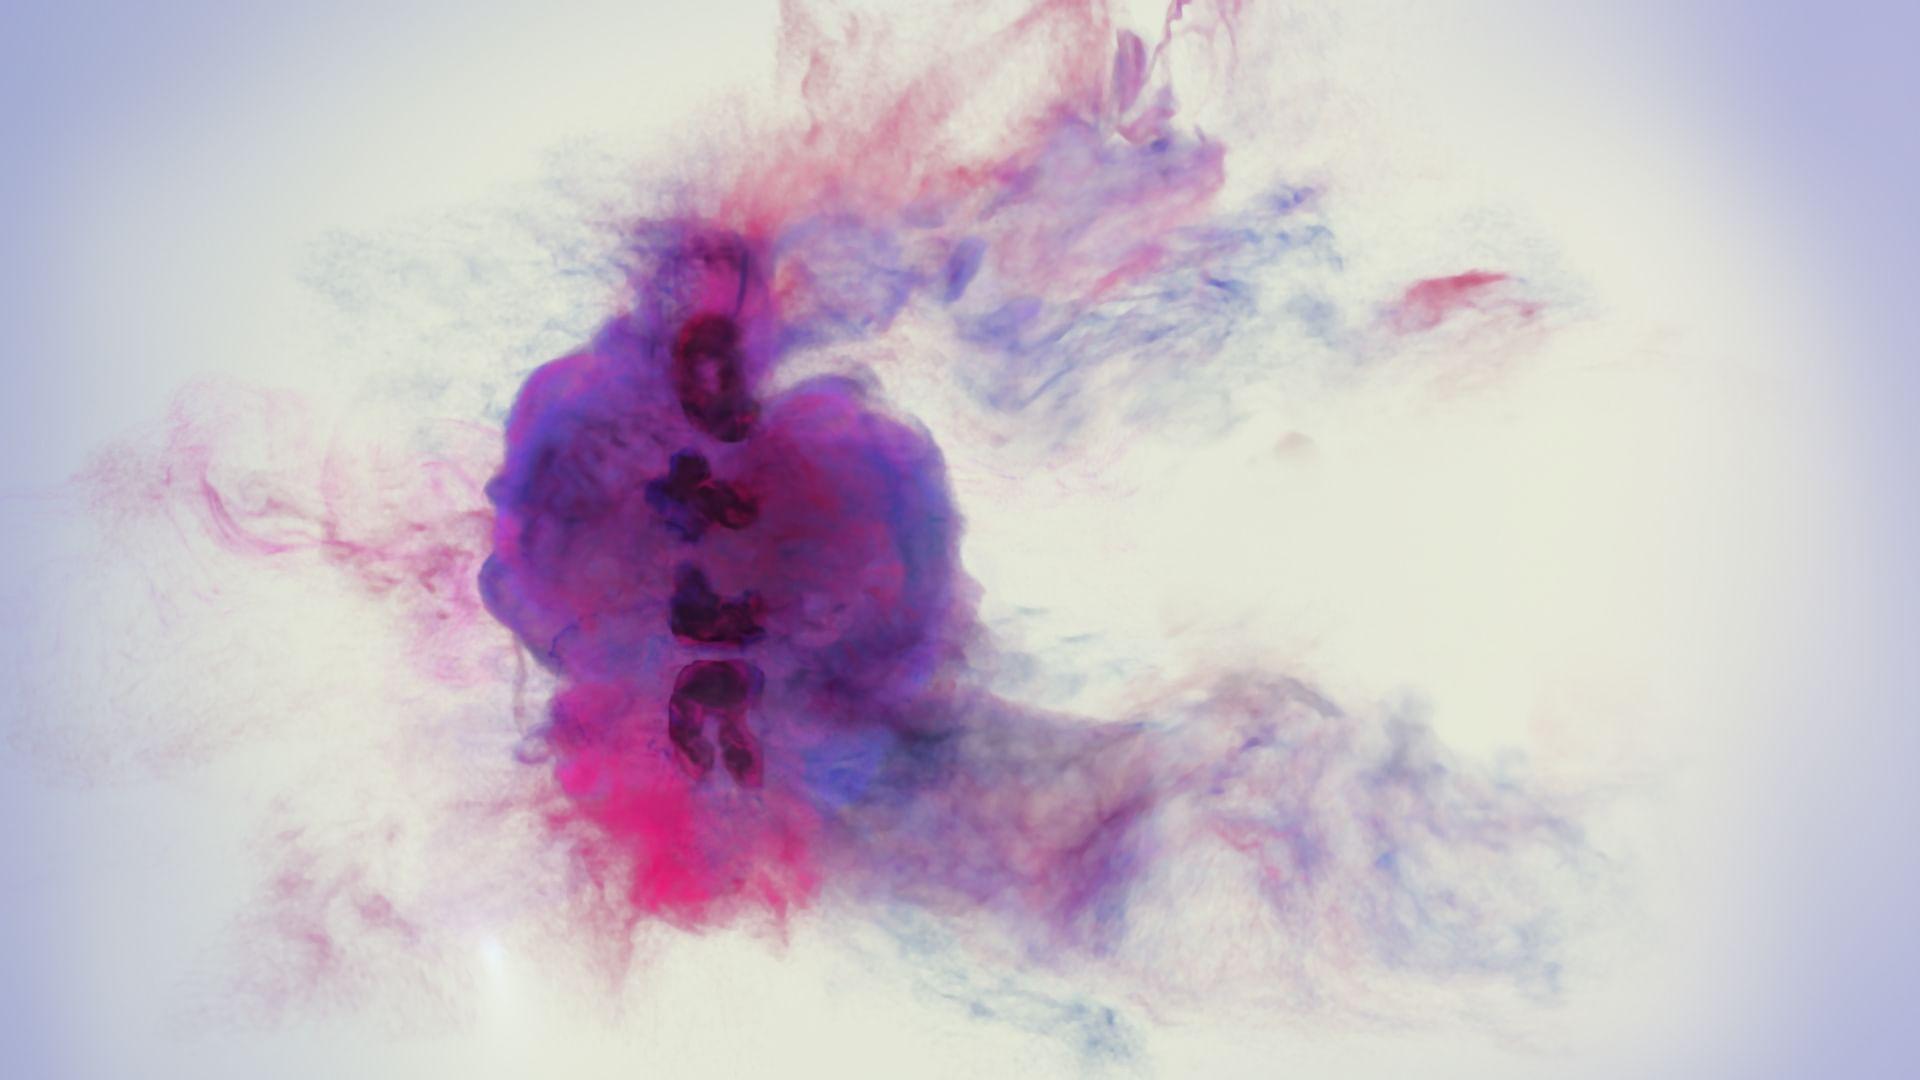 La révolution culturelle en ex-RDA